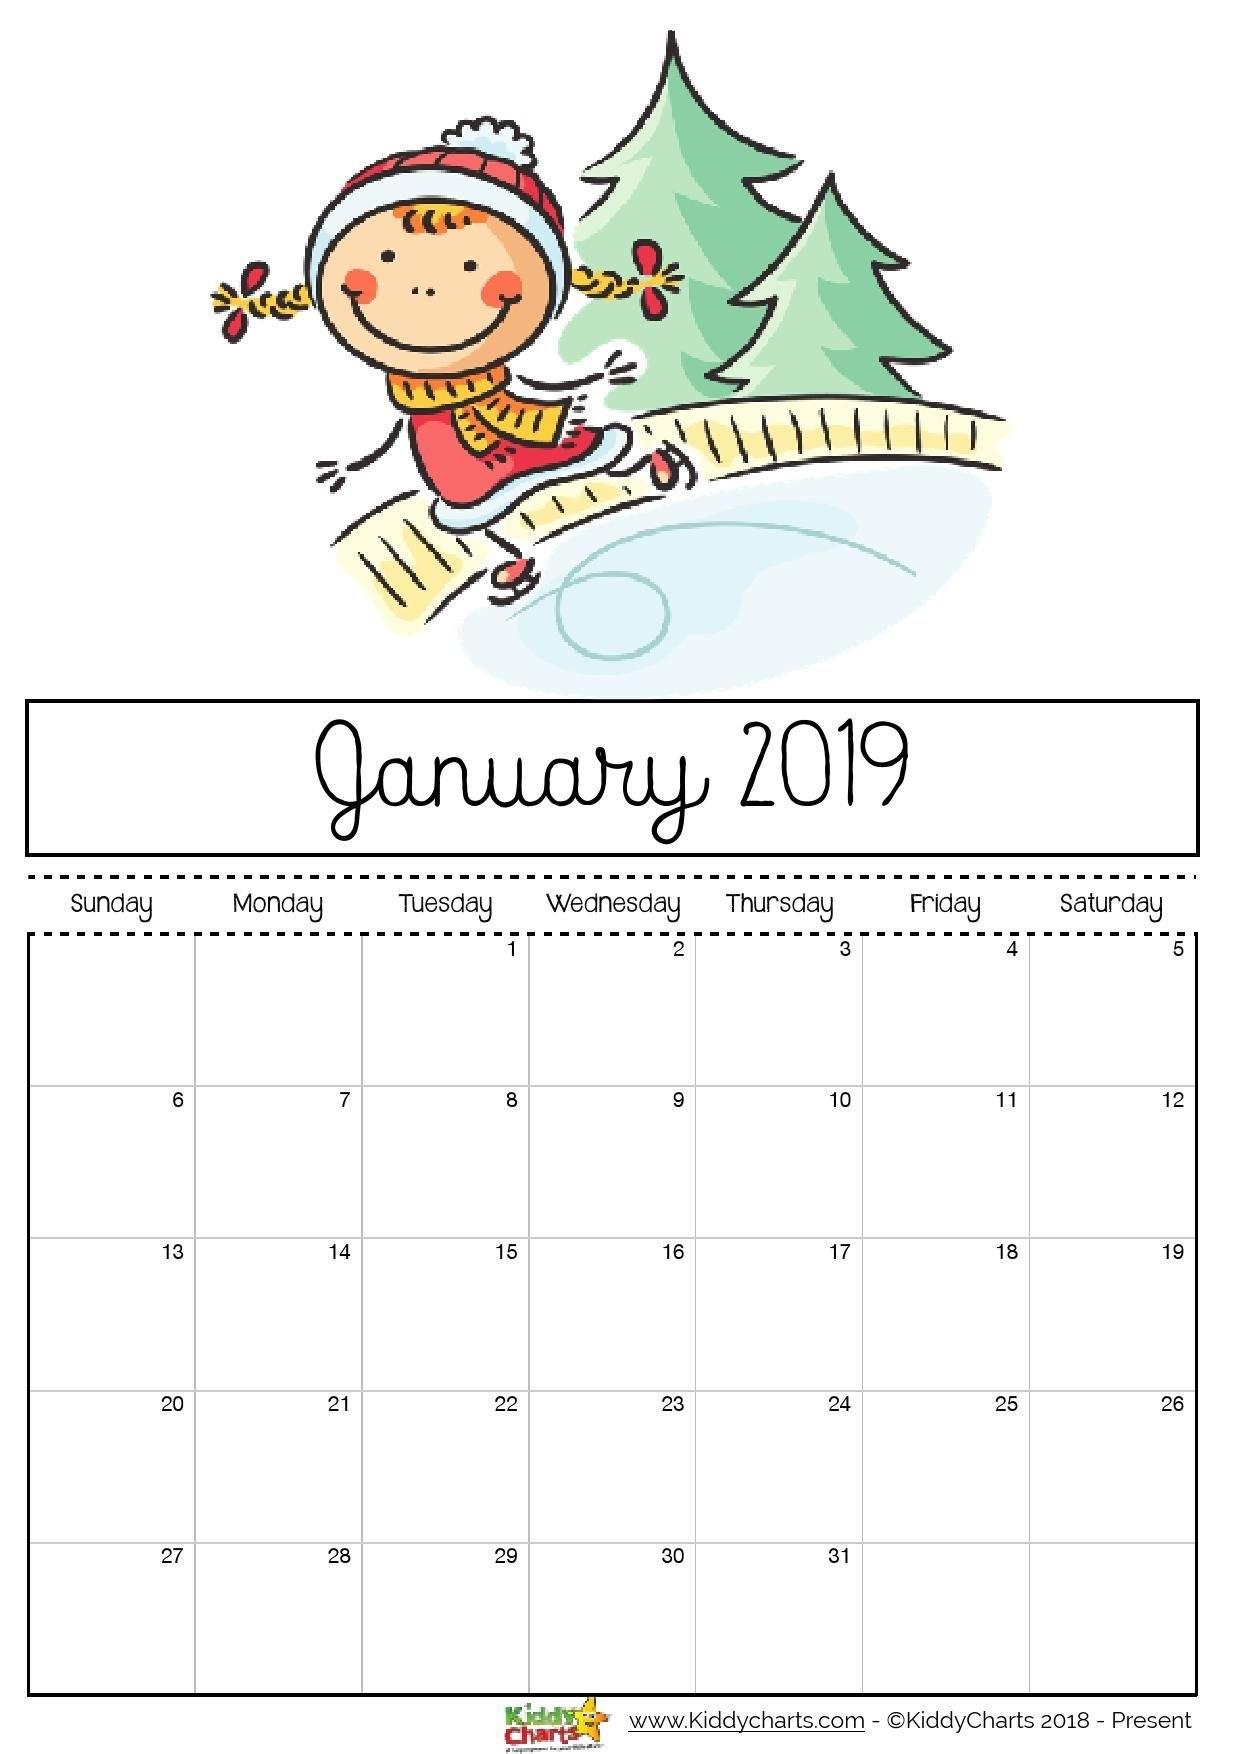 Free Printable 2019 Calendar - Print Yours Here   Planner Calendar 2019 Agenda